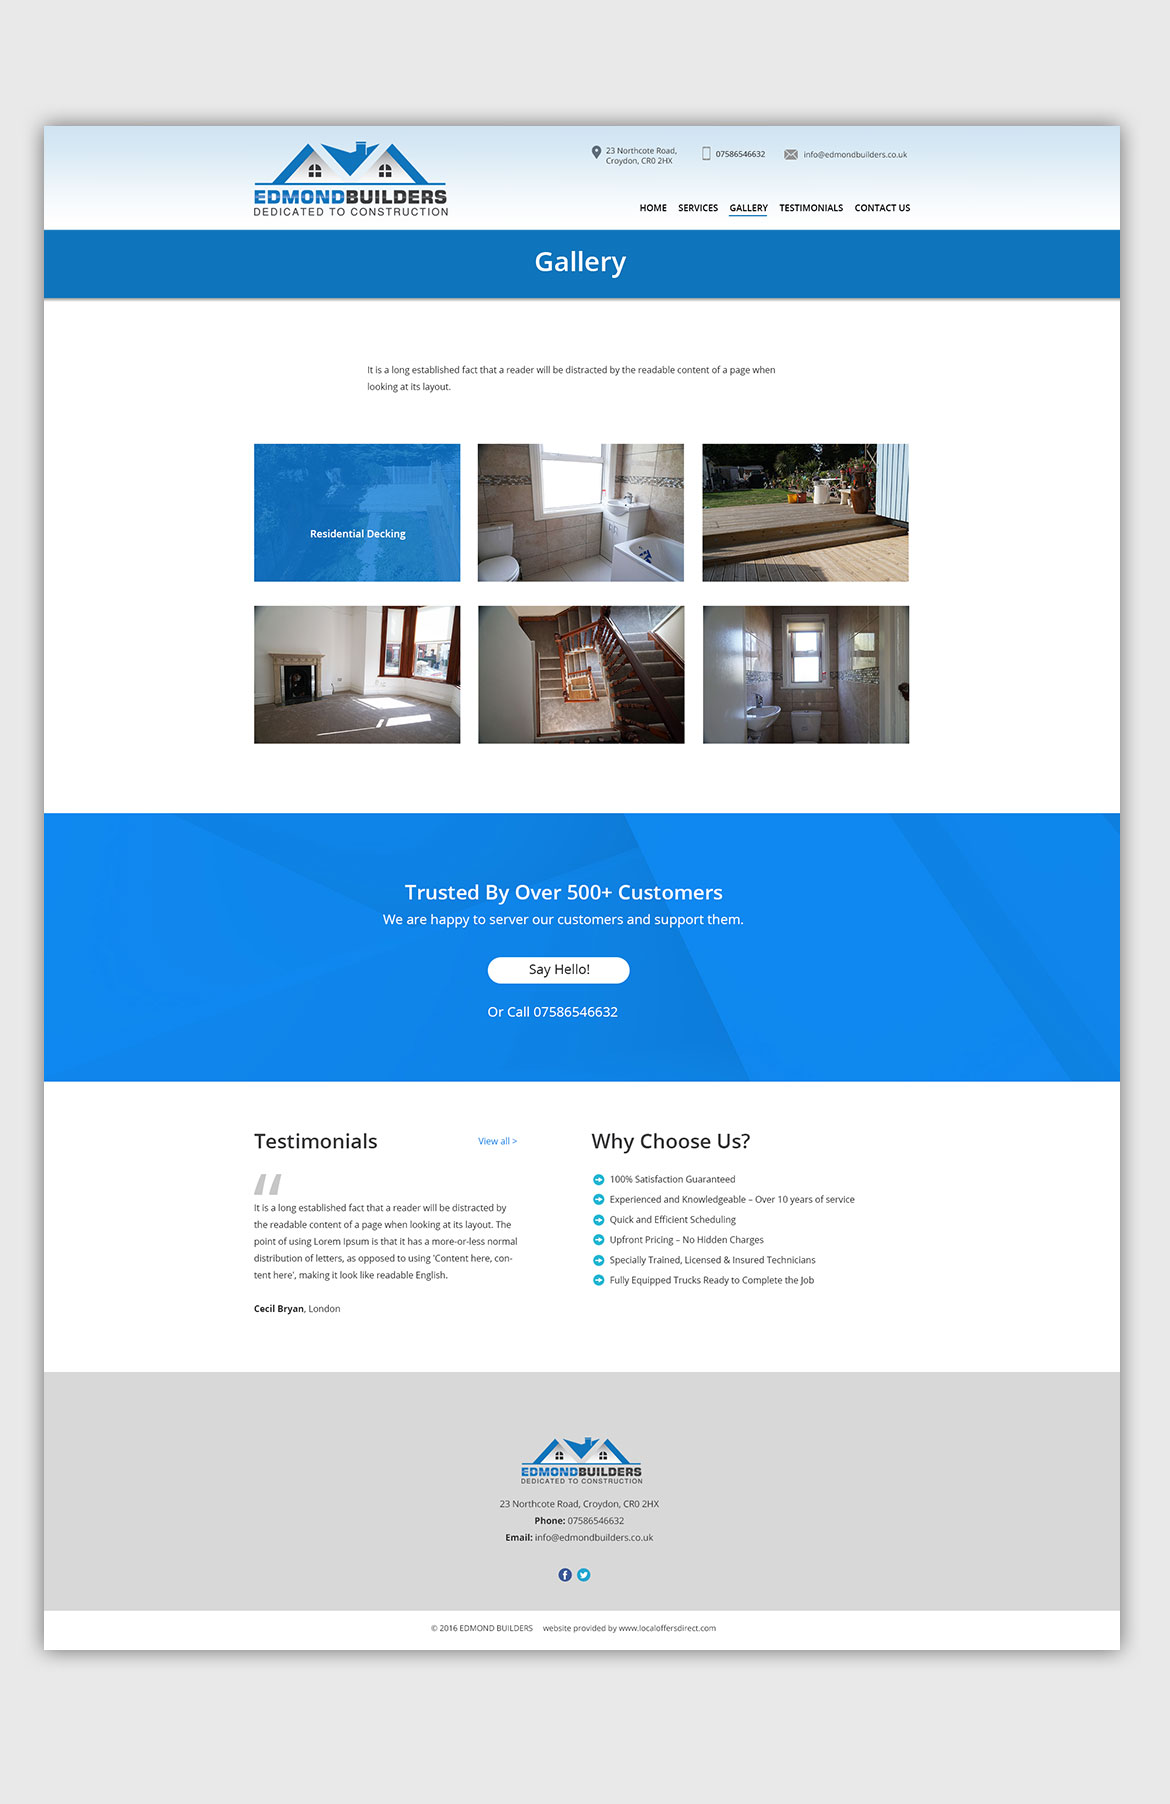 property-maintenace-company-web-design-uk-gallery